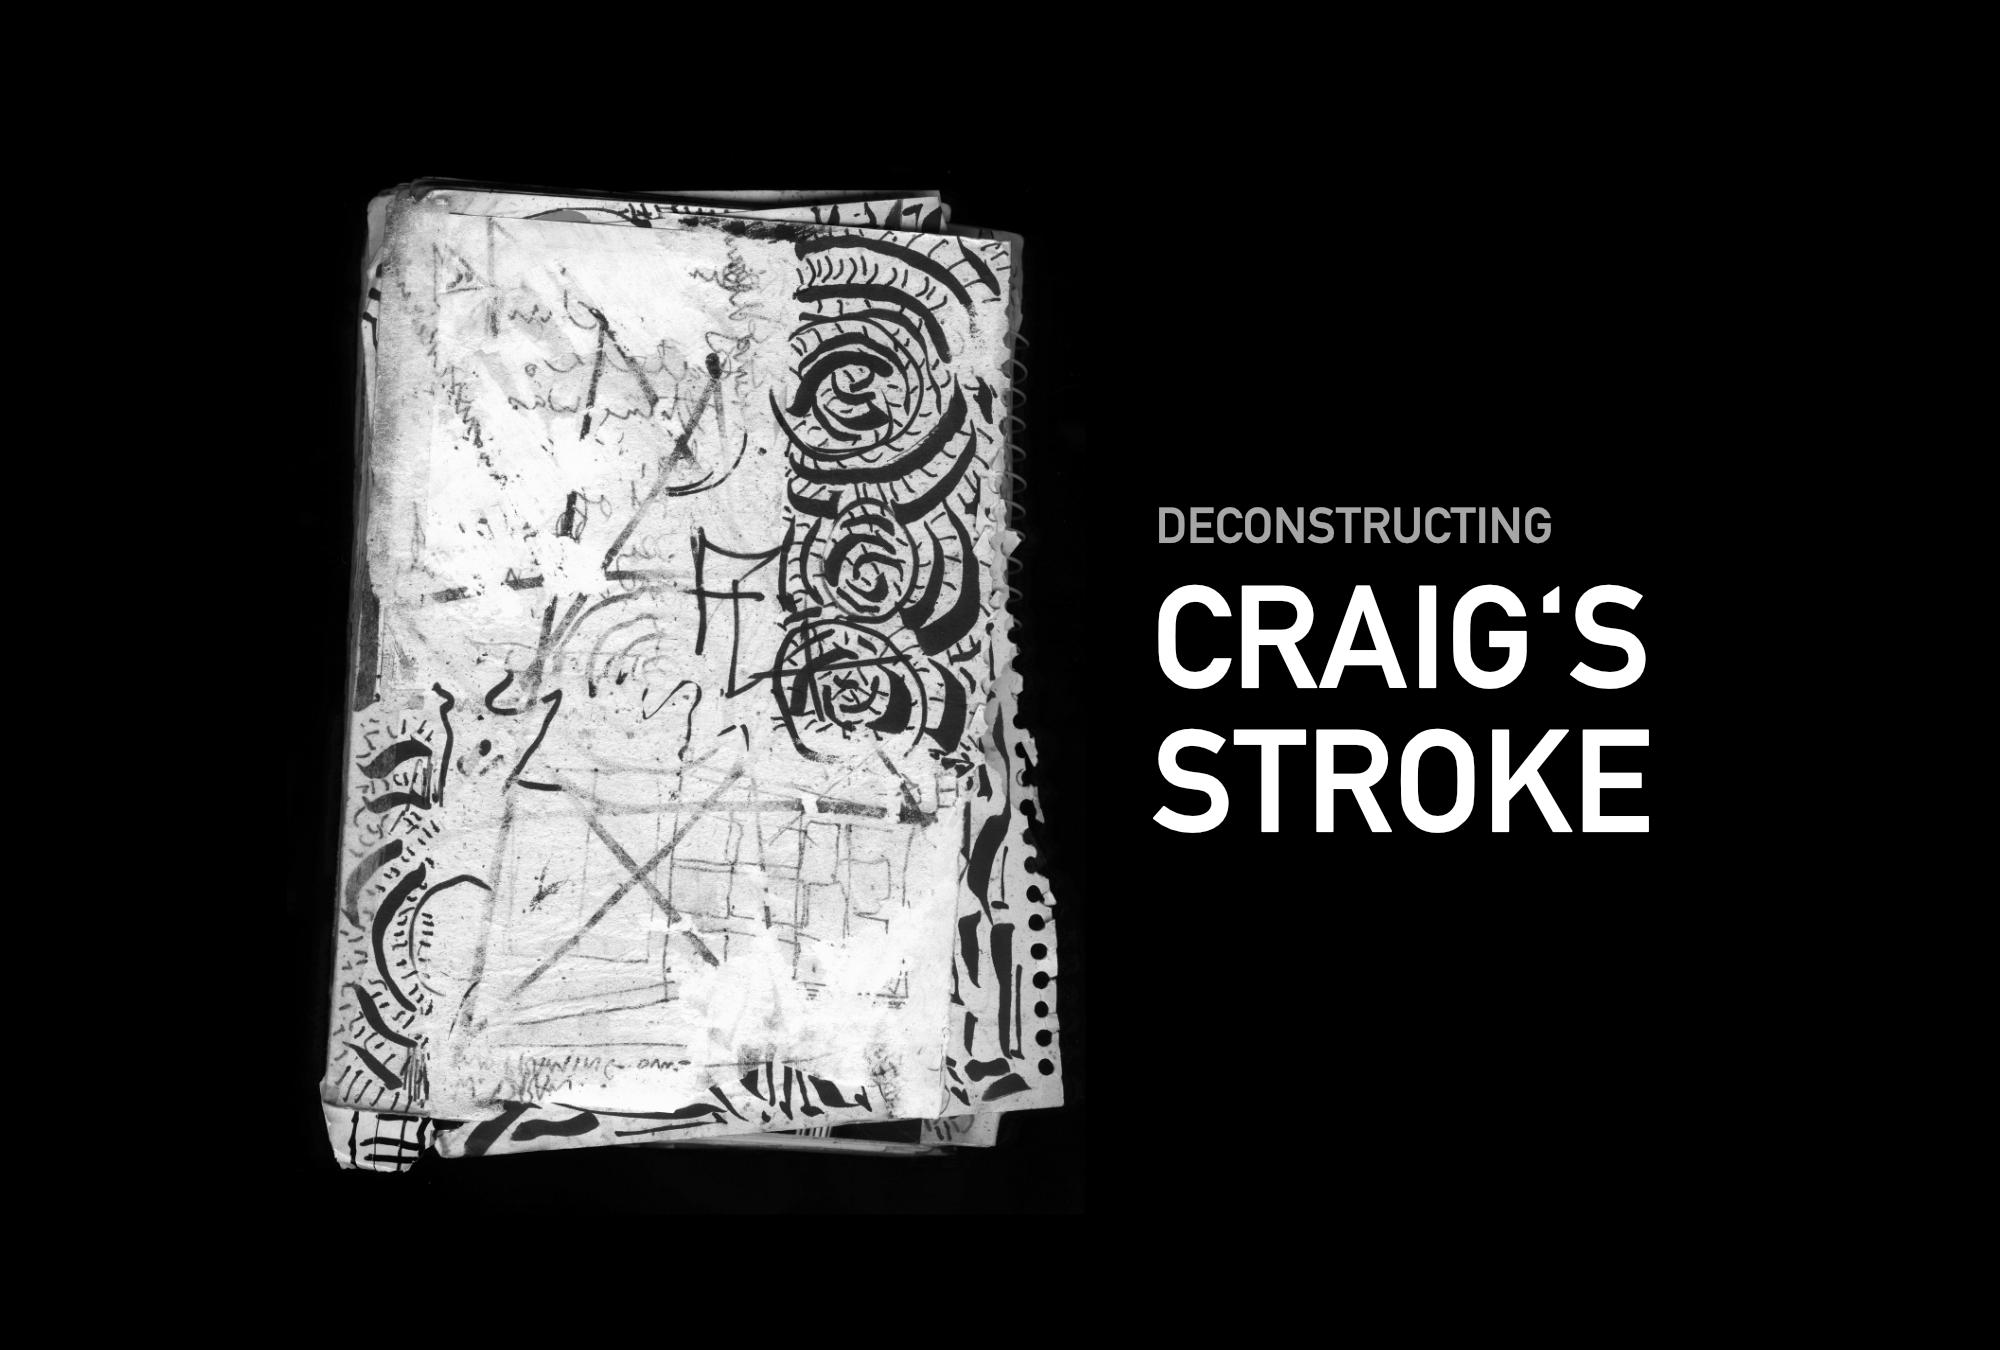 Deconstructing Craig's Stroke